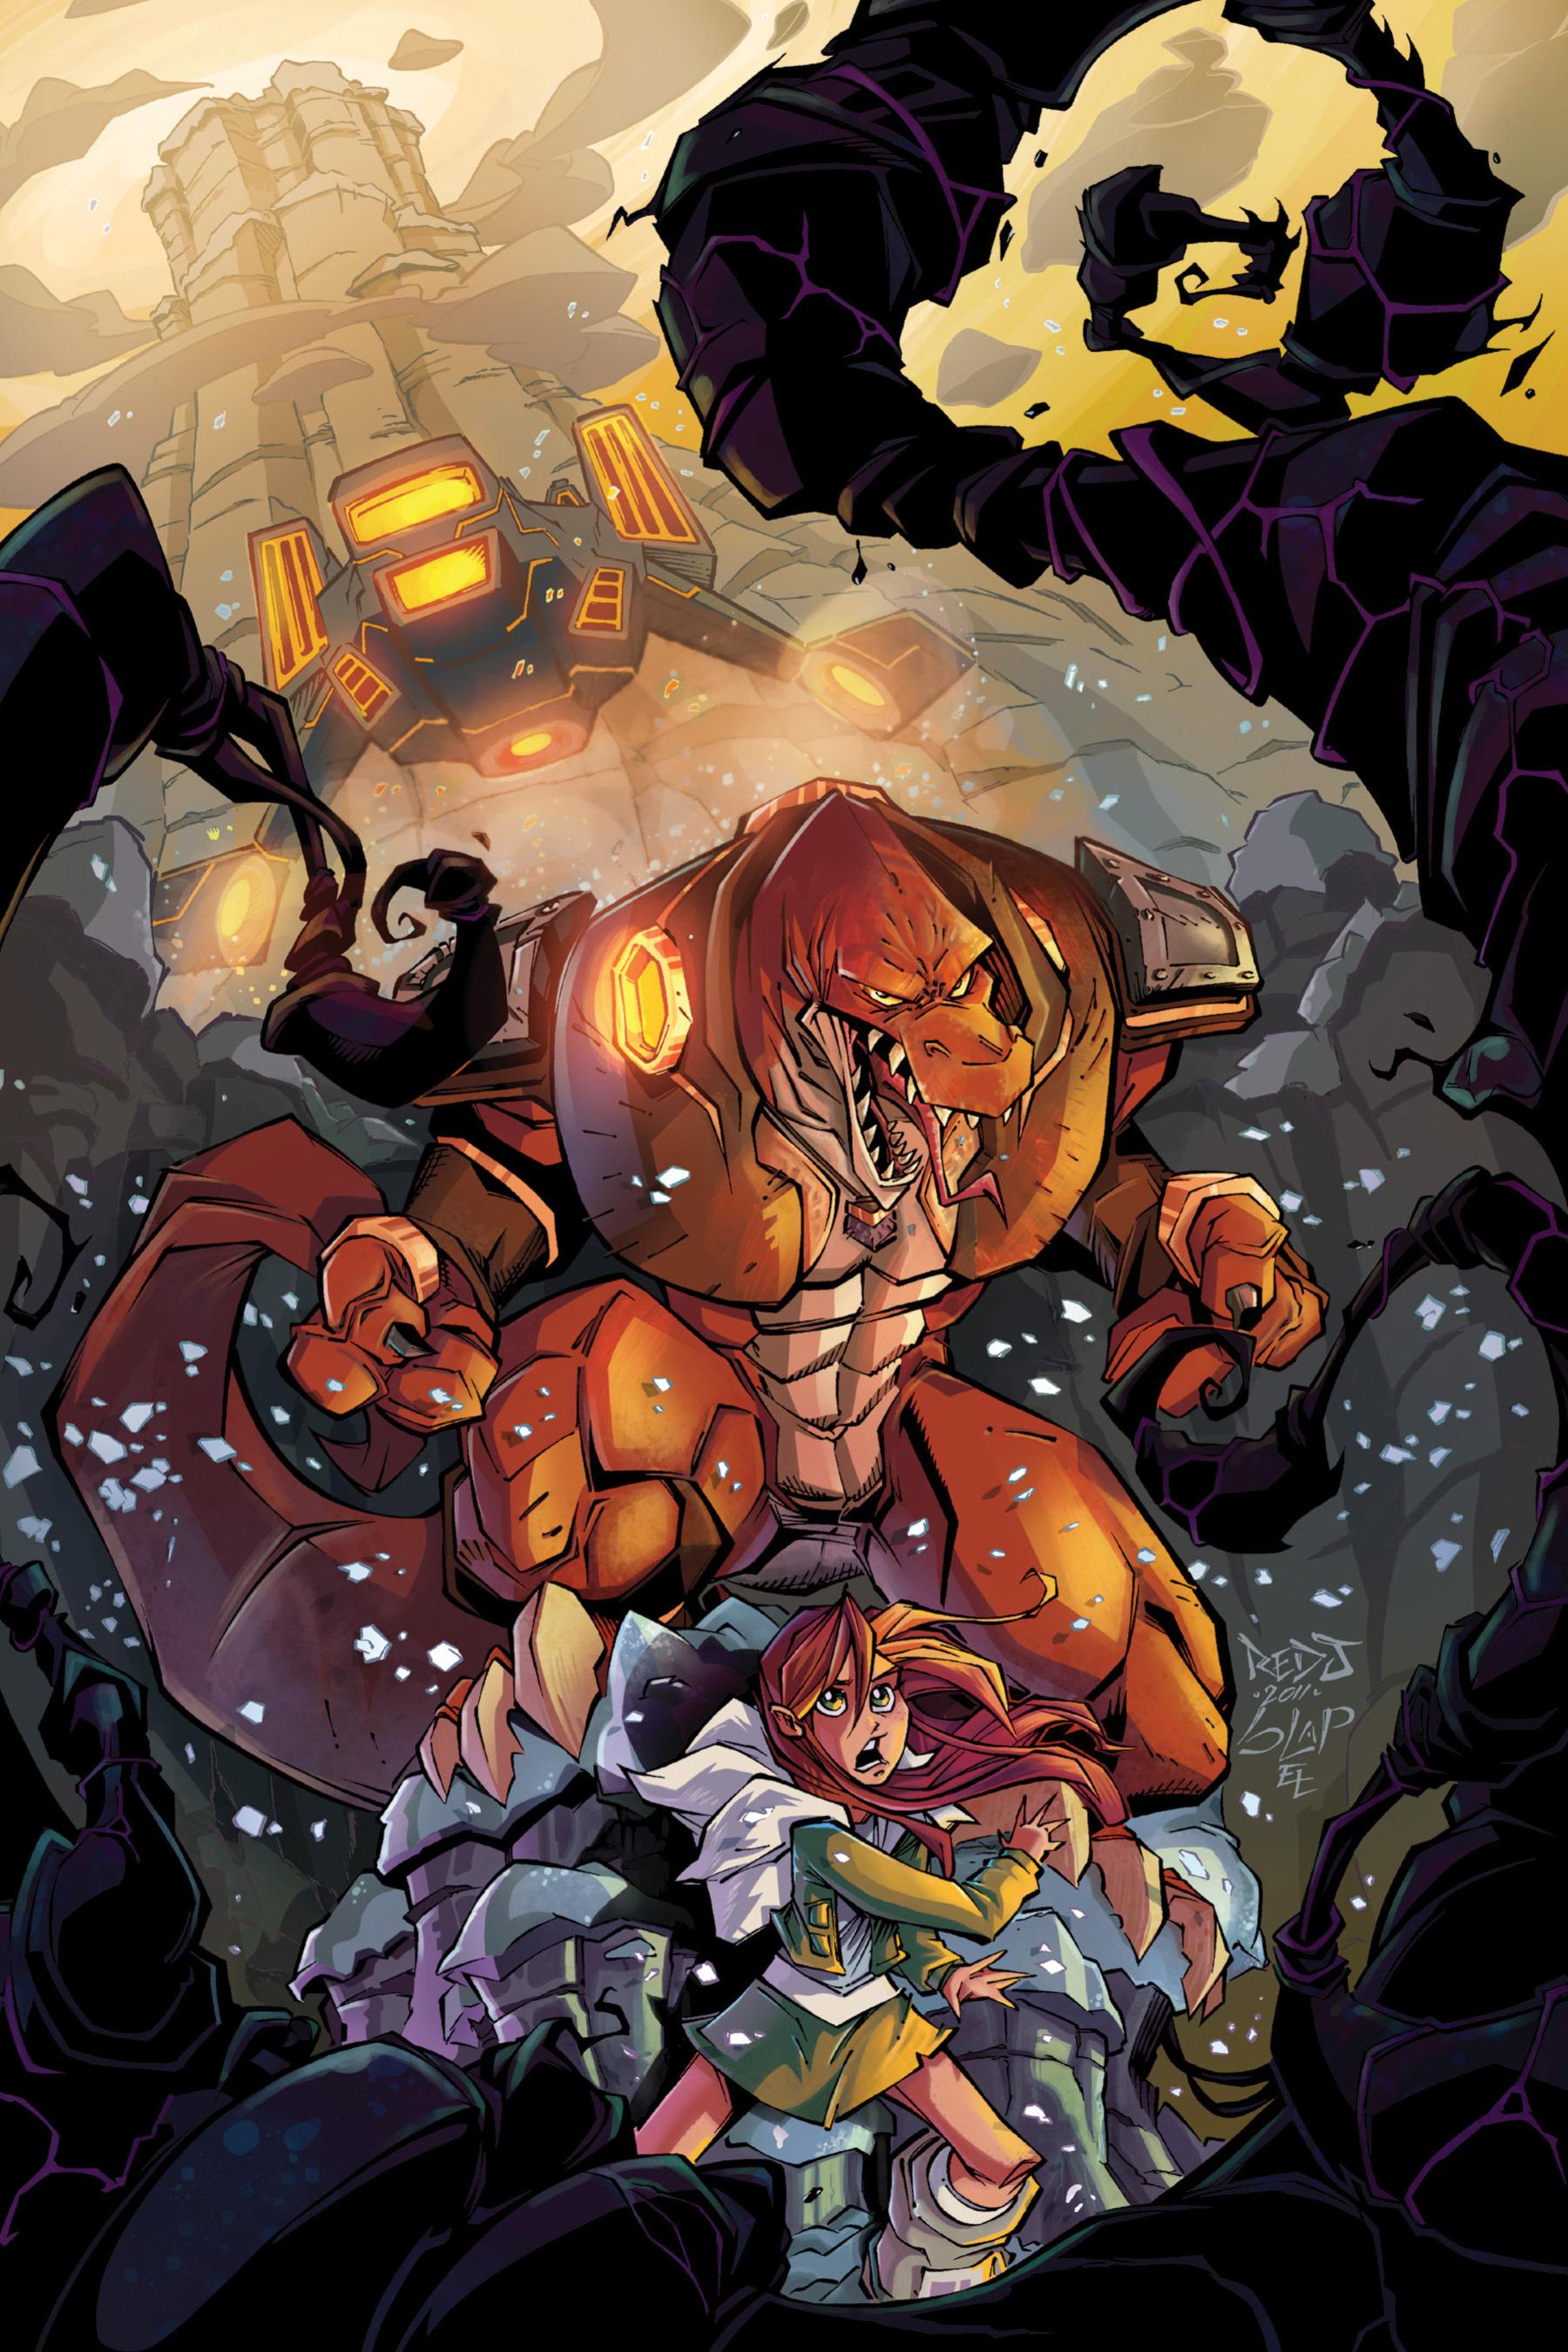 Read online Rexodus comic -  Issue # Full - 8